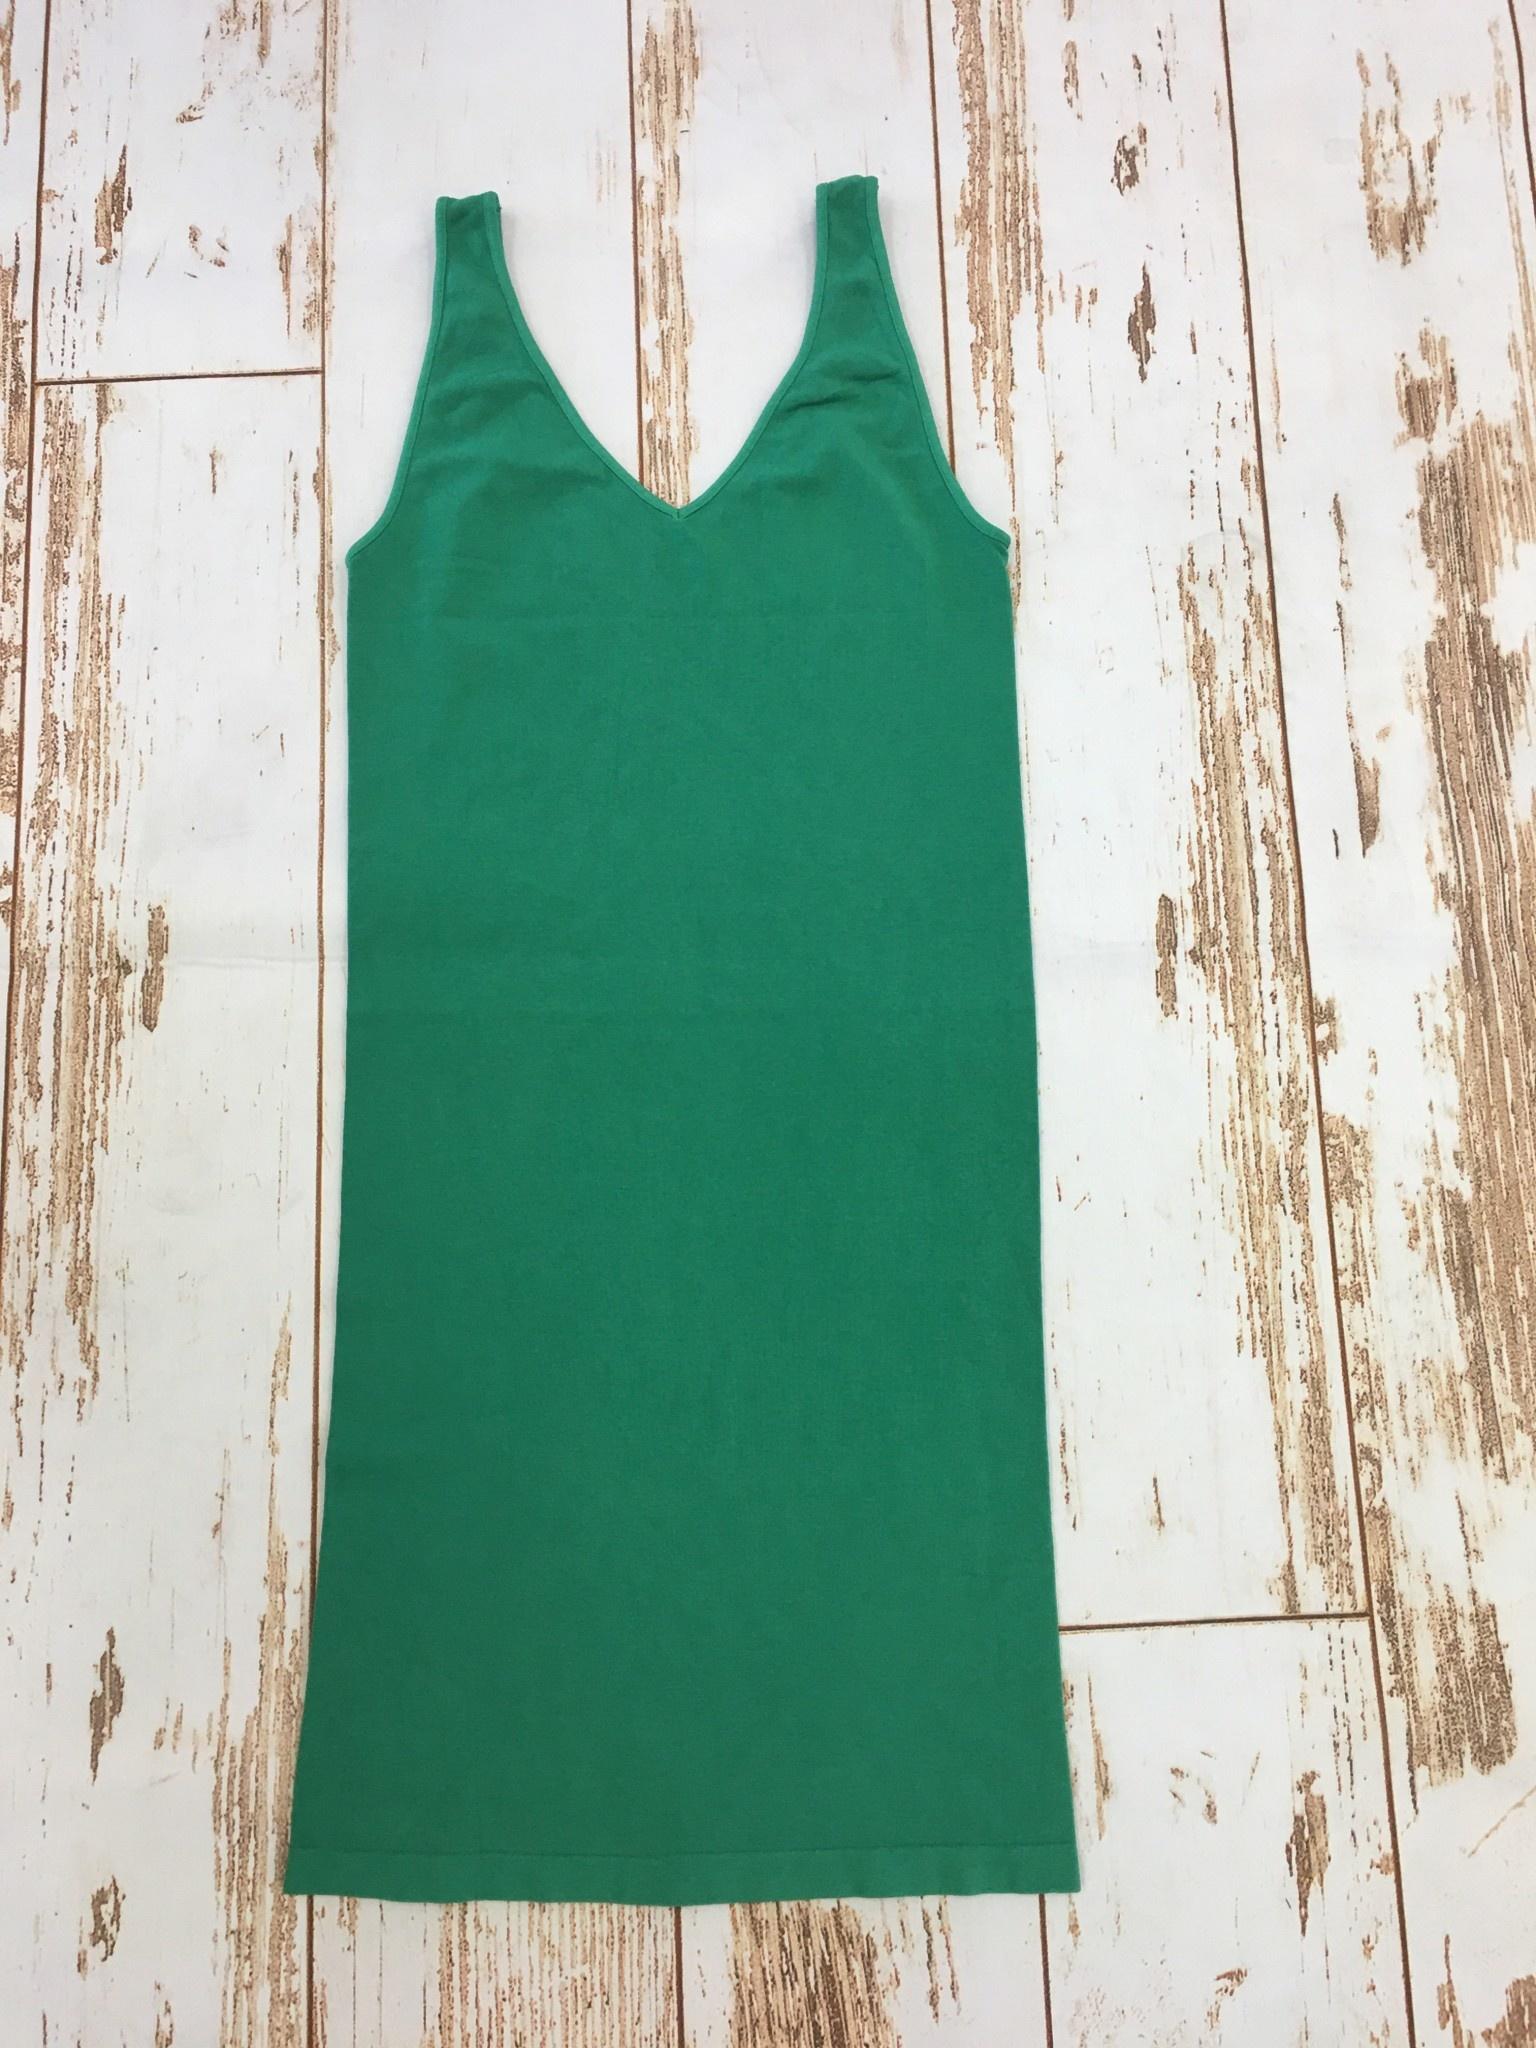 M Rena Tank Dress in Green